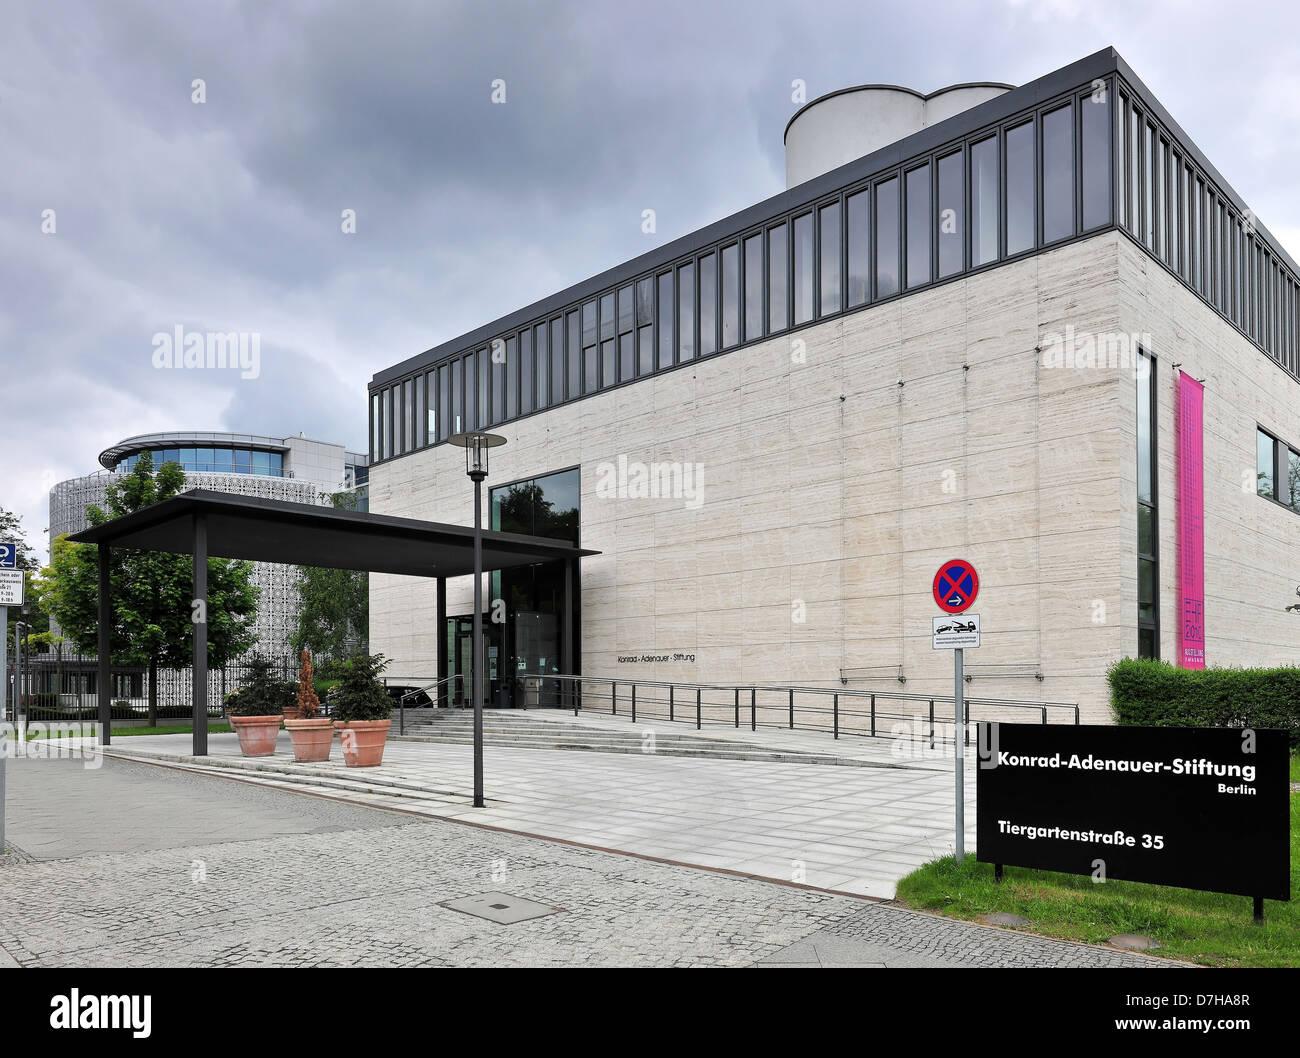 Dark clouds over the Konrad Adenauer Foundation in Berlin - Stock Image